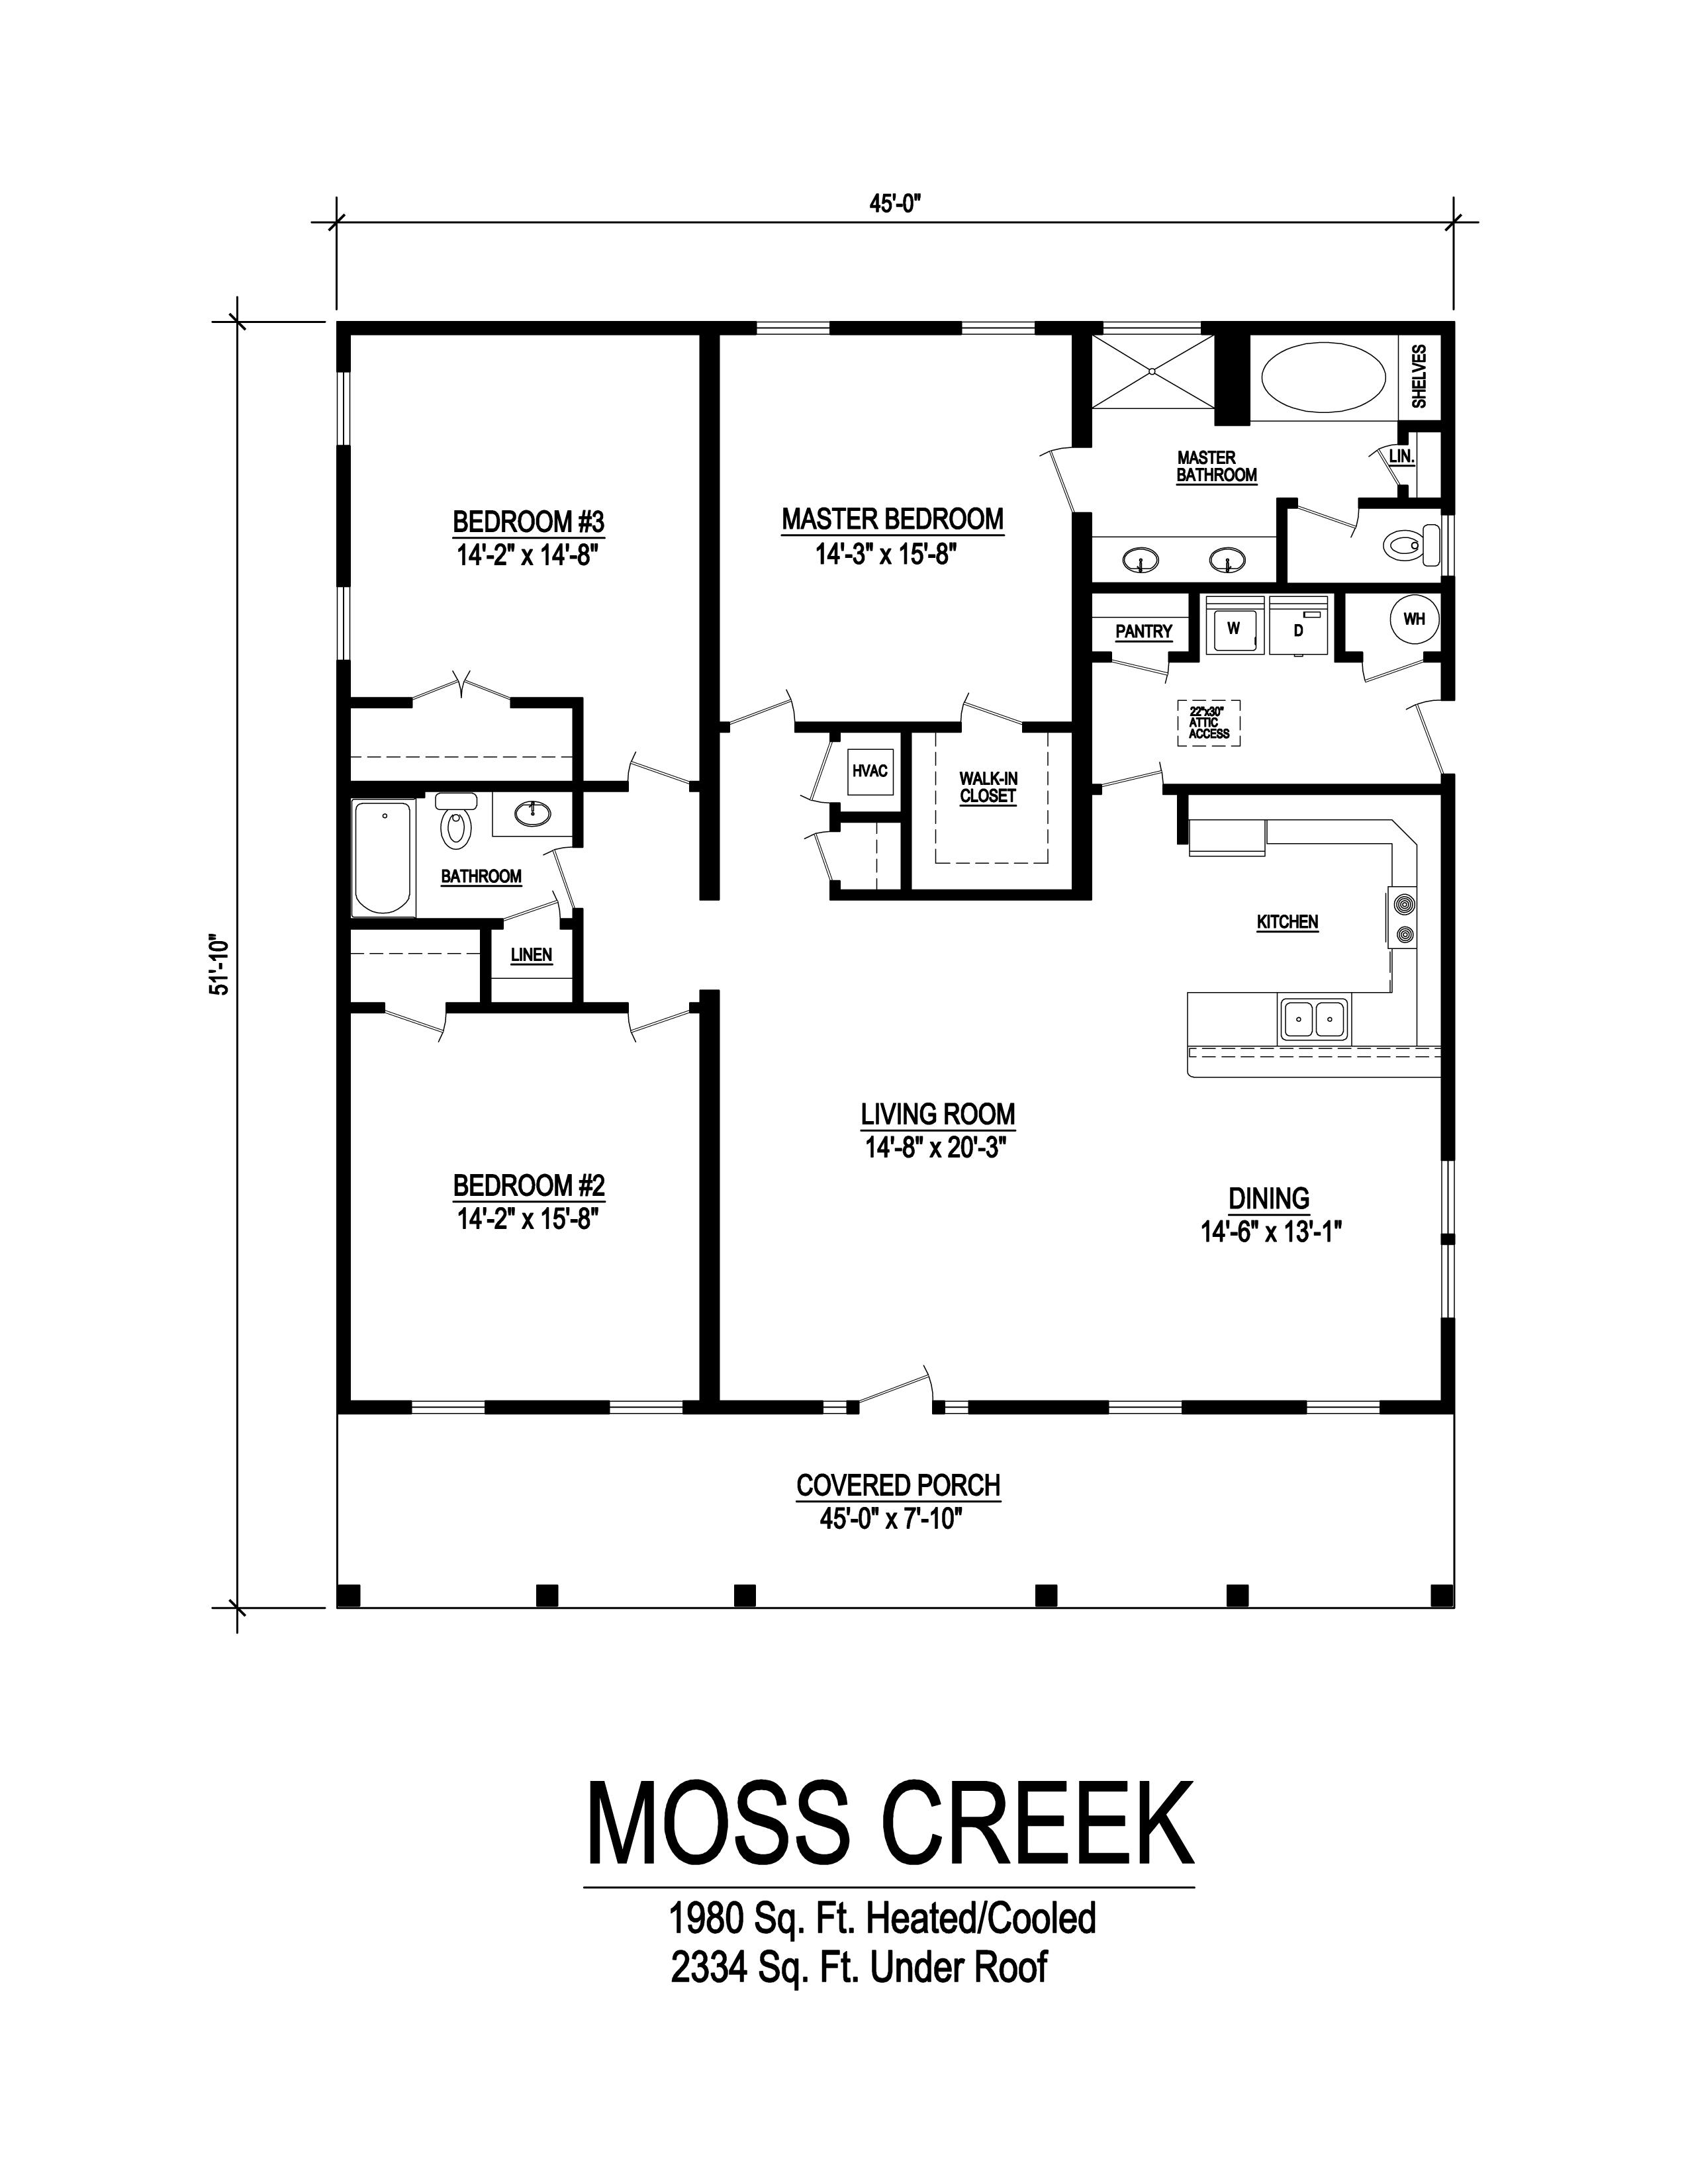 moss creek modular home floorplan